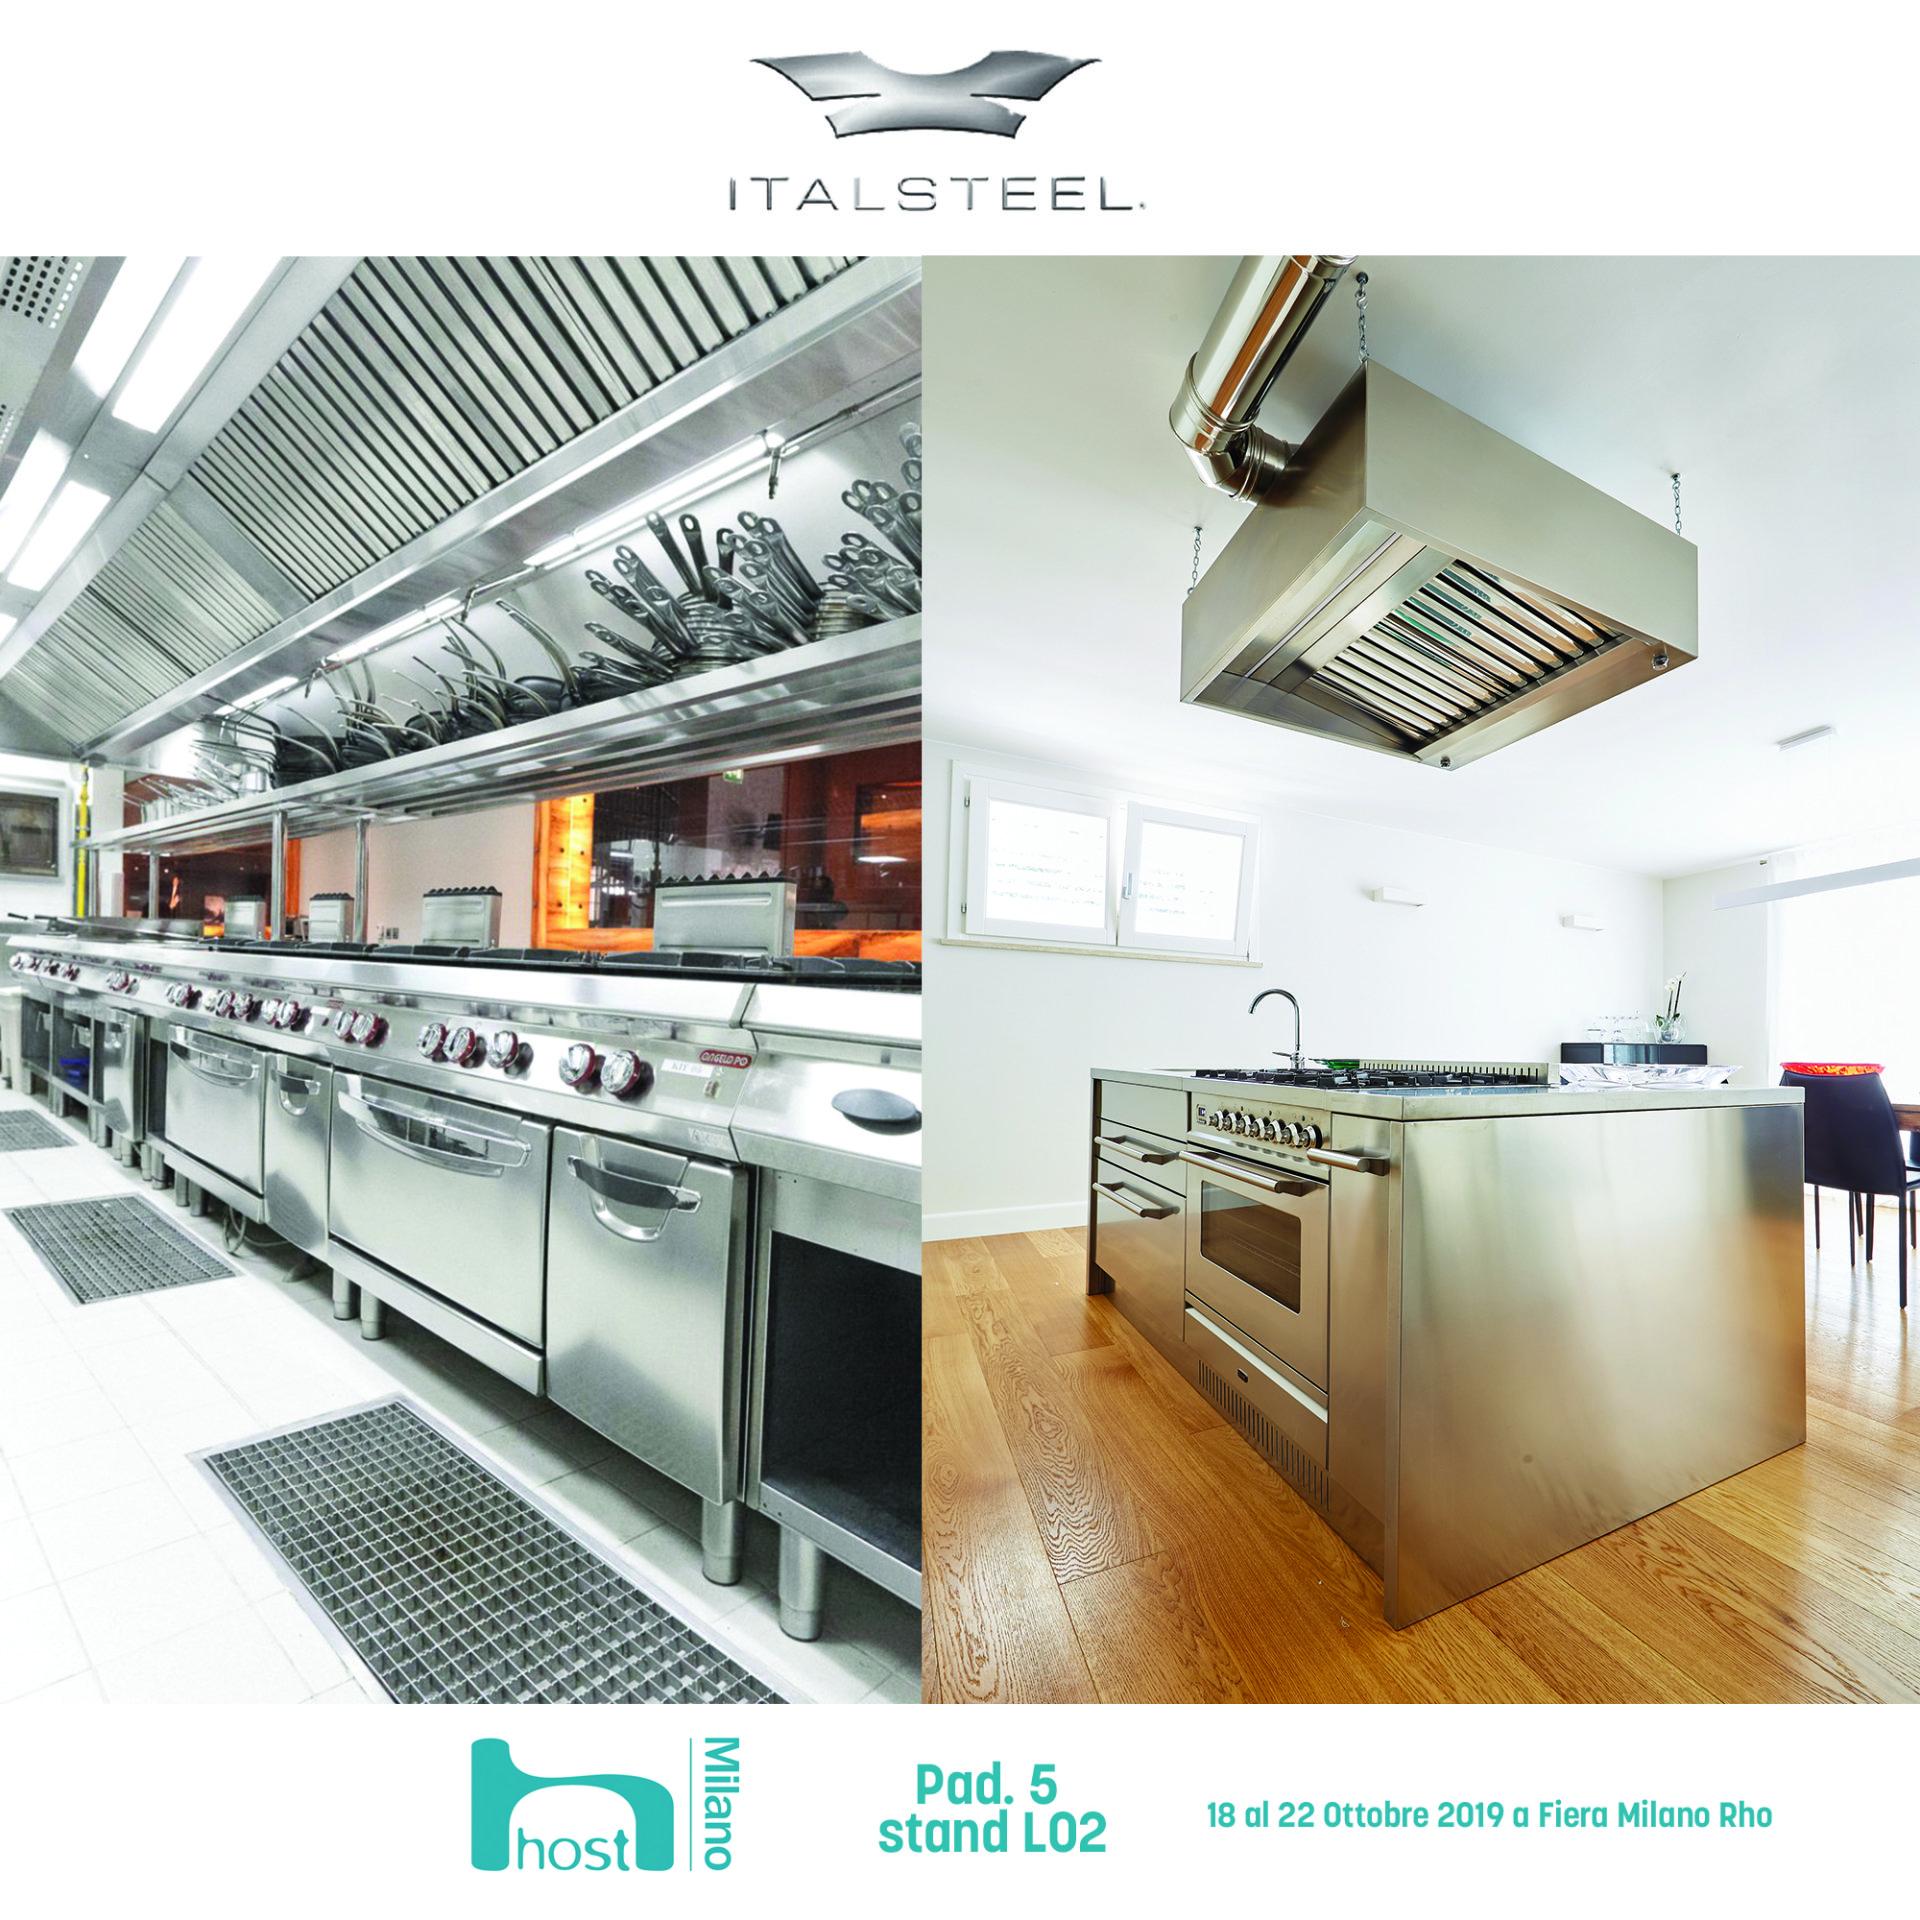 Mobili Cucina Professionale Acciaio.Produzione Mobili In Acciaio Inox Prato Italsteel